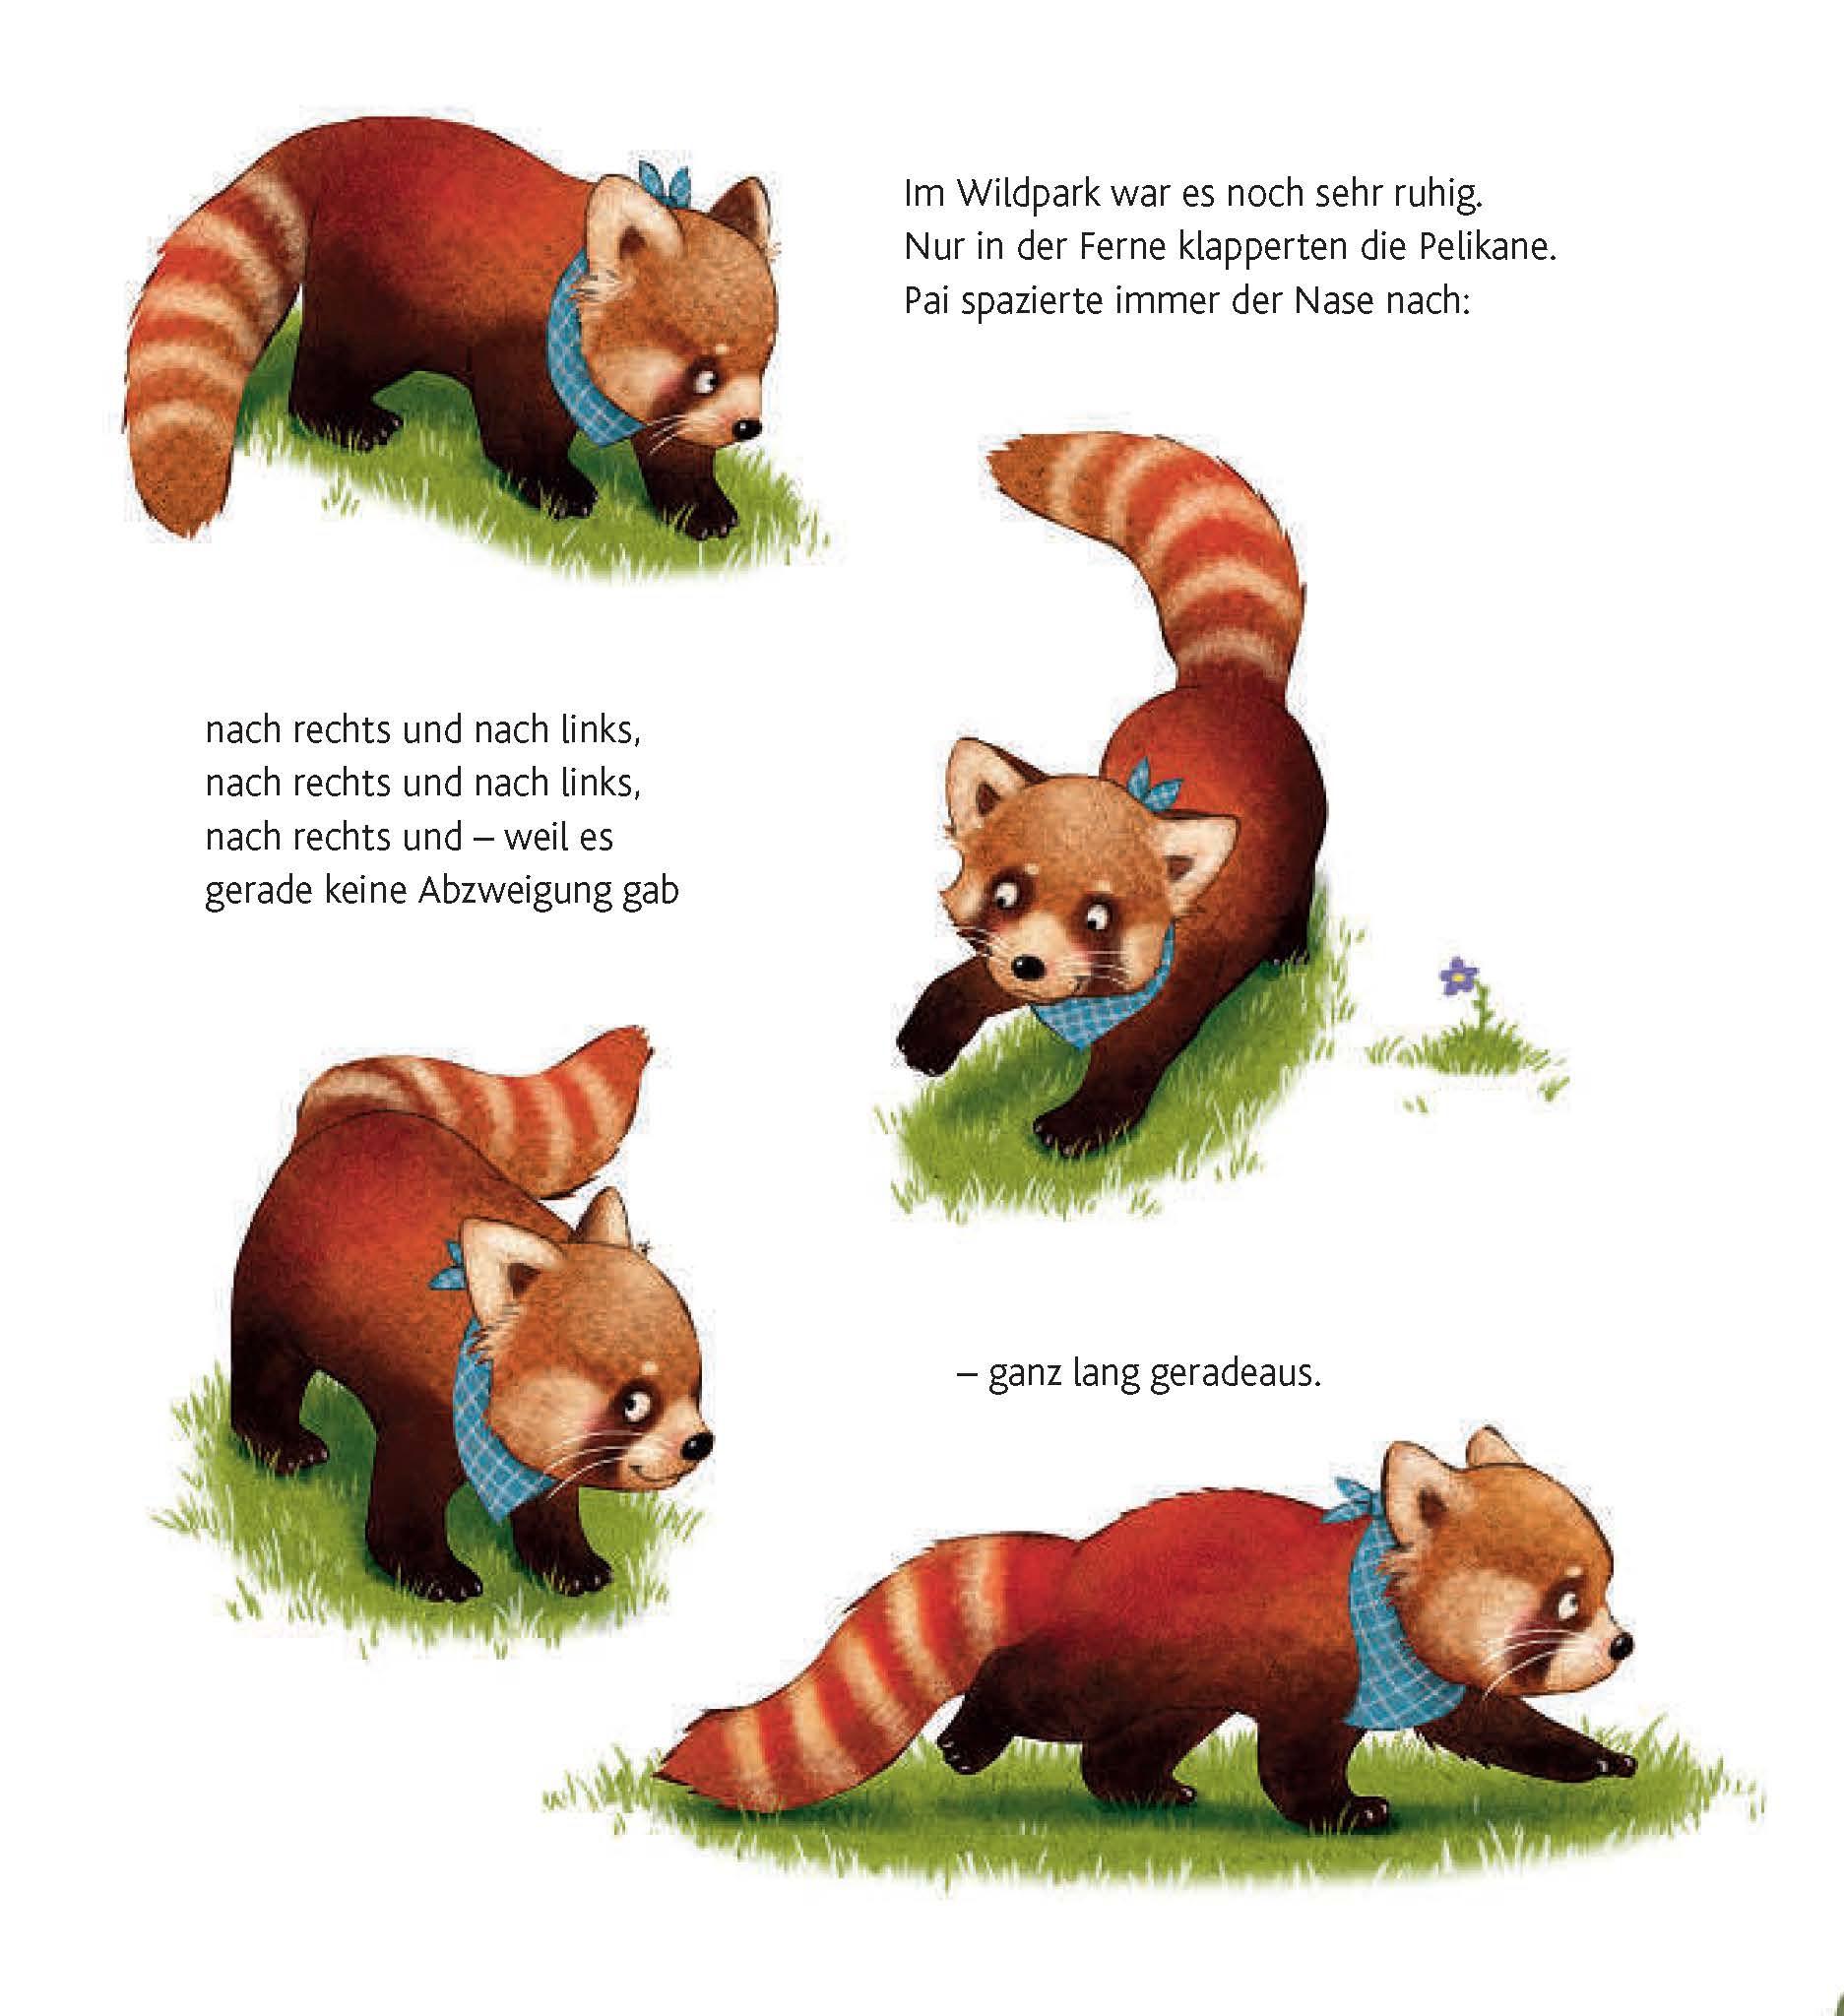 Kleiner Panda Pai Leseprobe Text Saskia Hula Illustration Kerstin Schoene Copyright Loewe Verlag Bindlach 2016